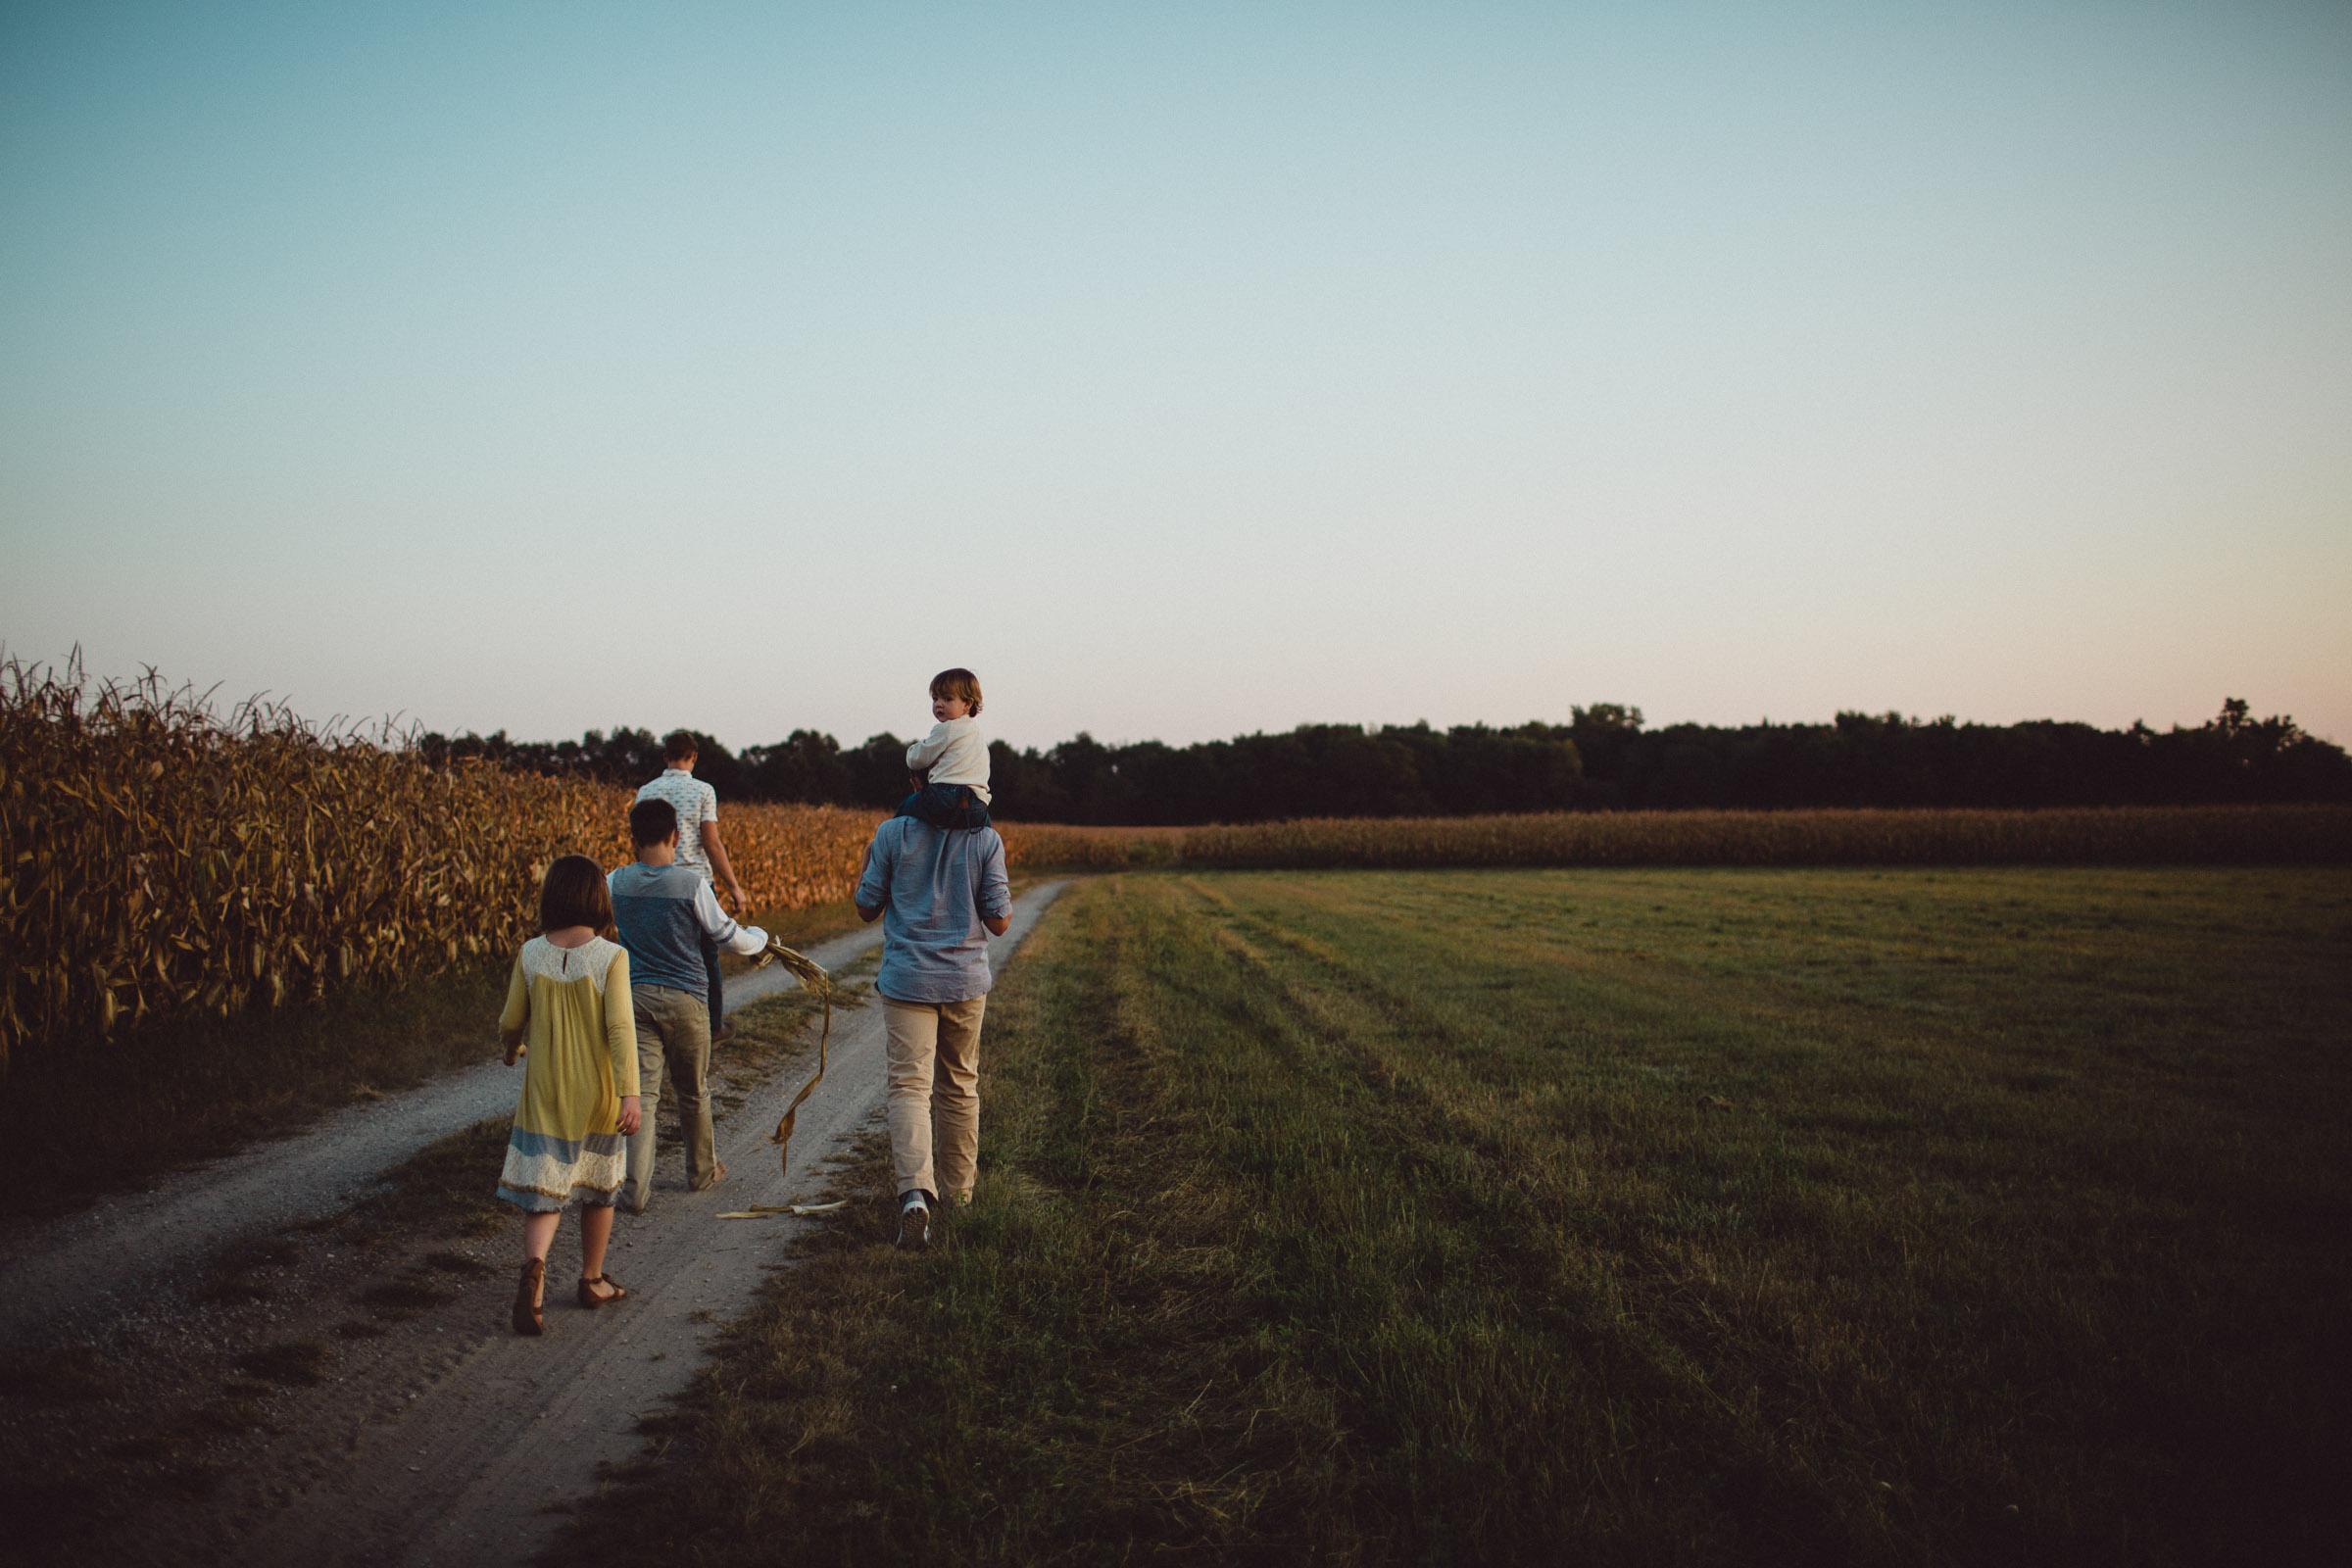 siblings walking together through cornfields